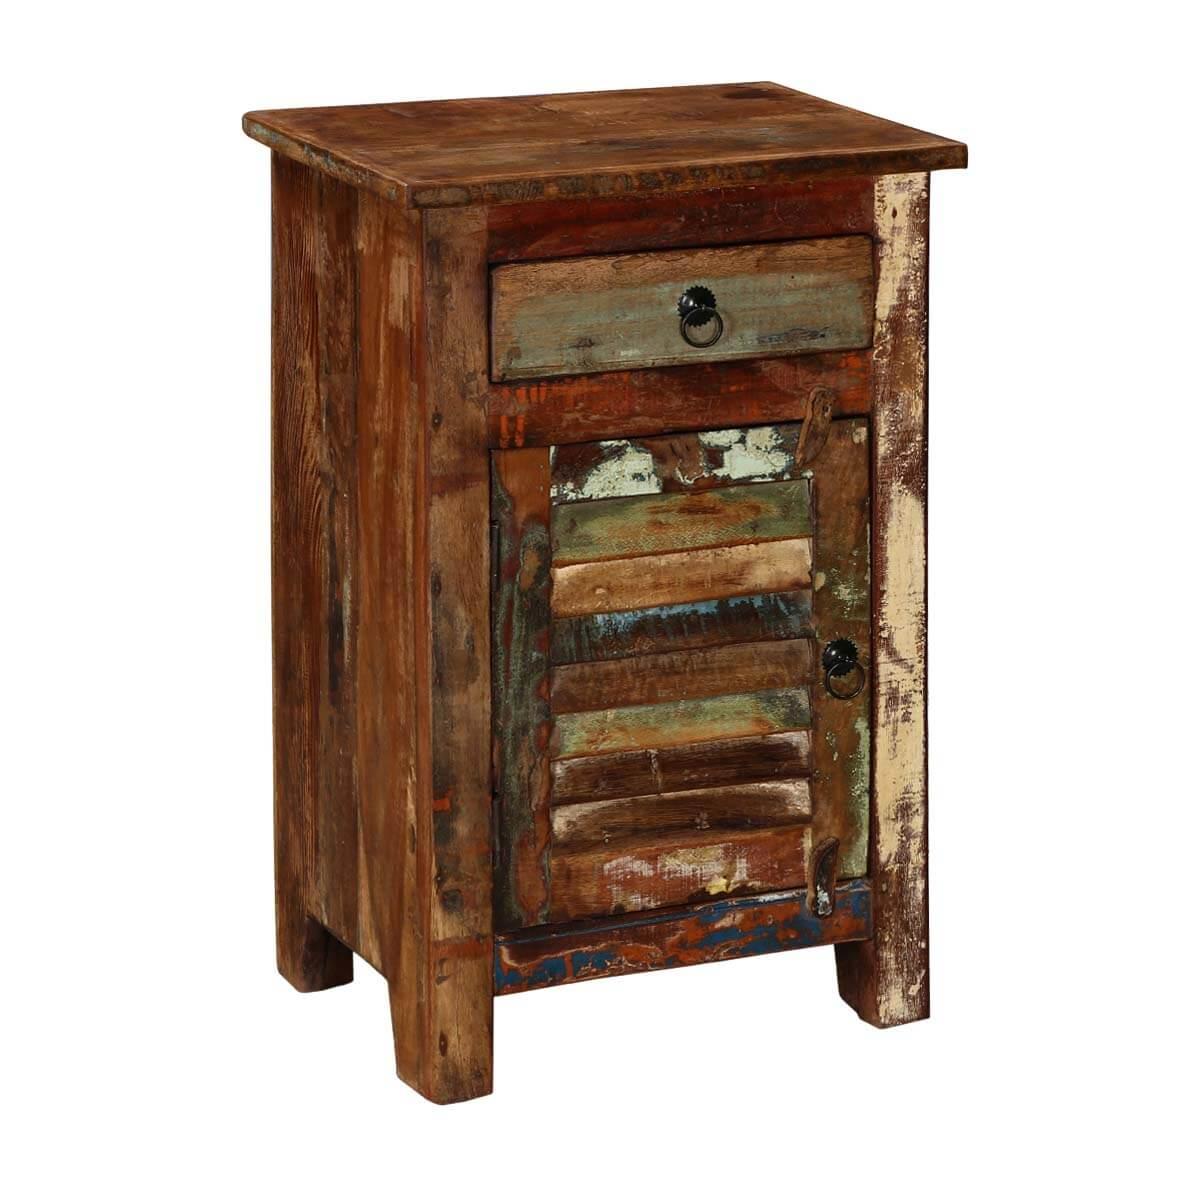 Cheap Wood Flooring Atlanta: Atlanta Chic Reclaimed Solid Wood 1 Drawer Nightstand